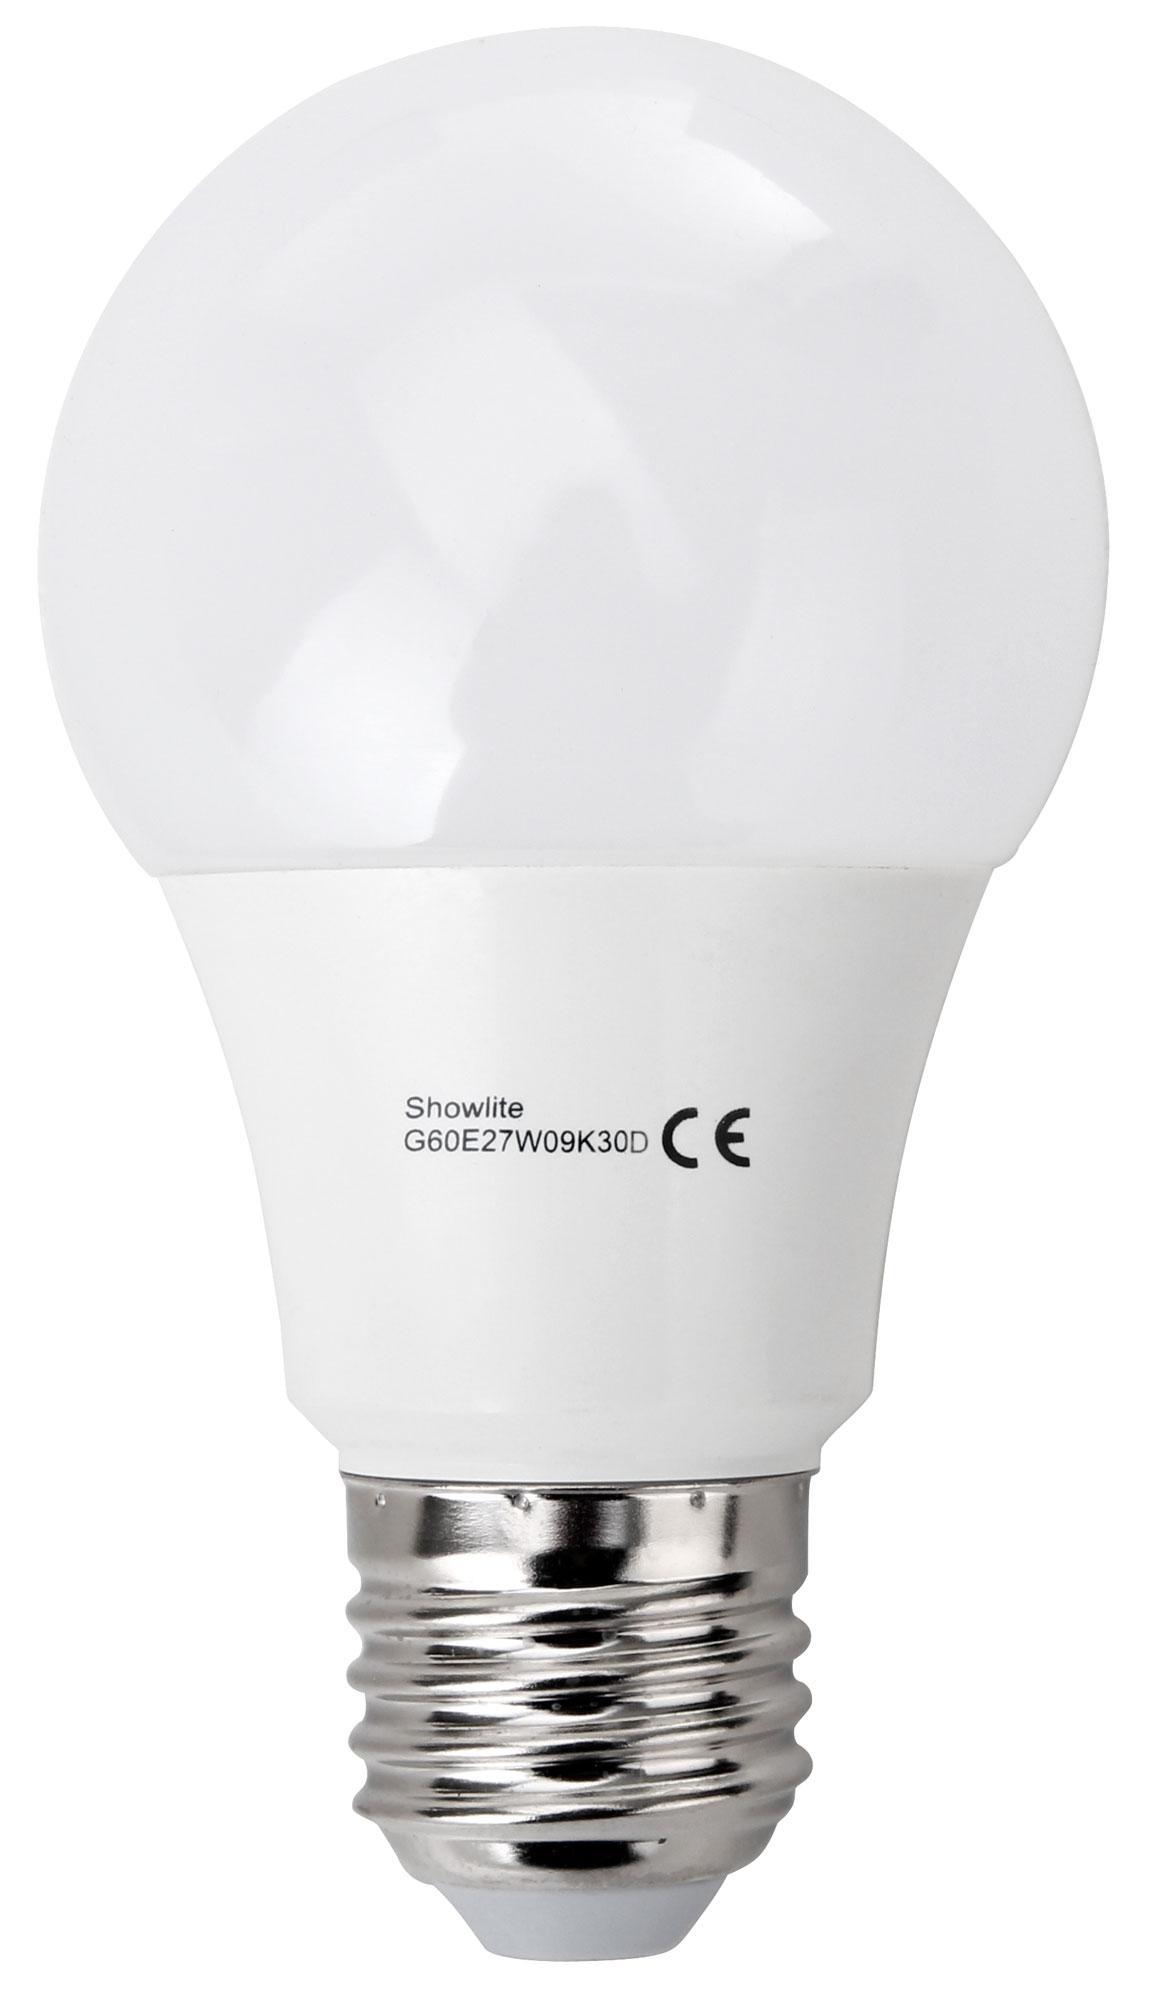 four piece set showlite led bulb g60e27w09k30d 9 watt 860 lumen e27 3000 kelvin dimmable. Black Bedroom Furniture Sets. Home Design Ideas